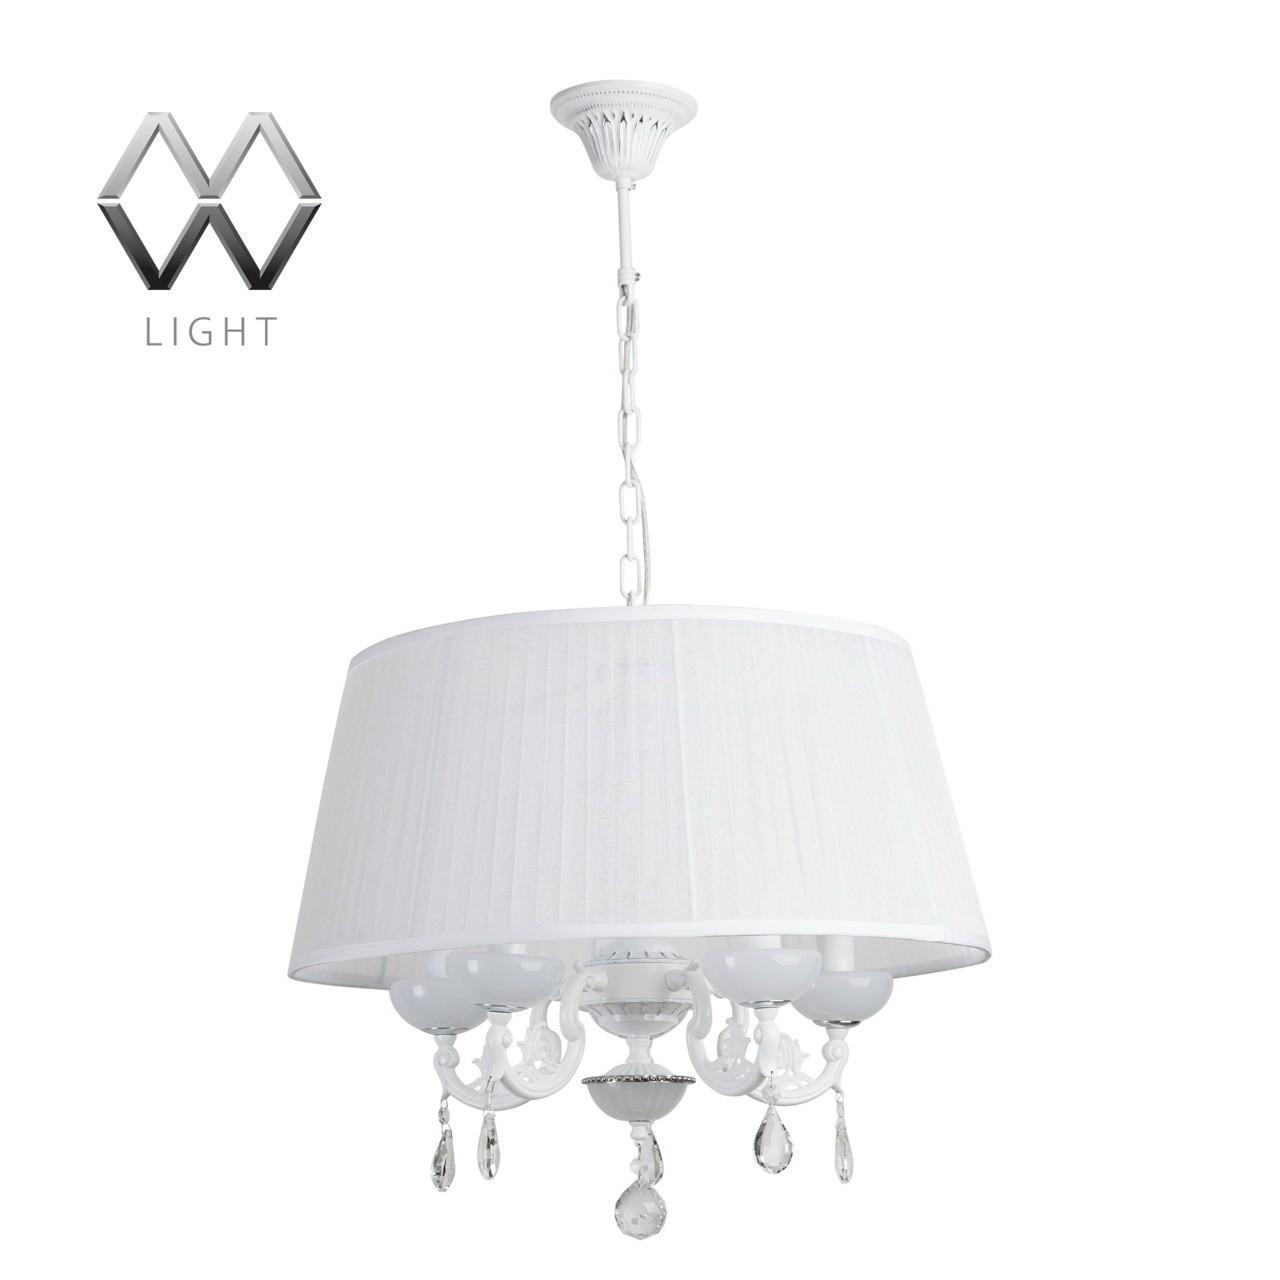 Люстра MW-LIGHT Селена 482011305 подвесная mw light подвесная люстра mw light селена 482011305